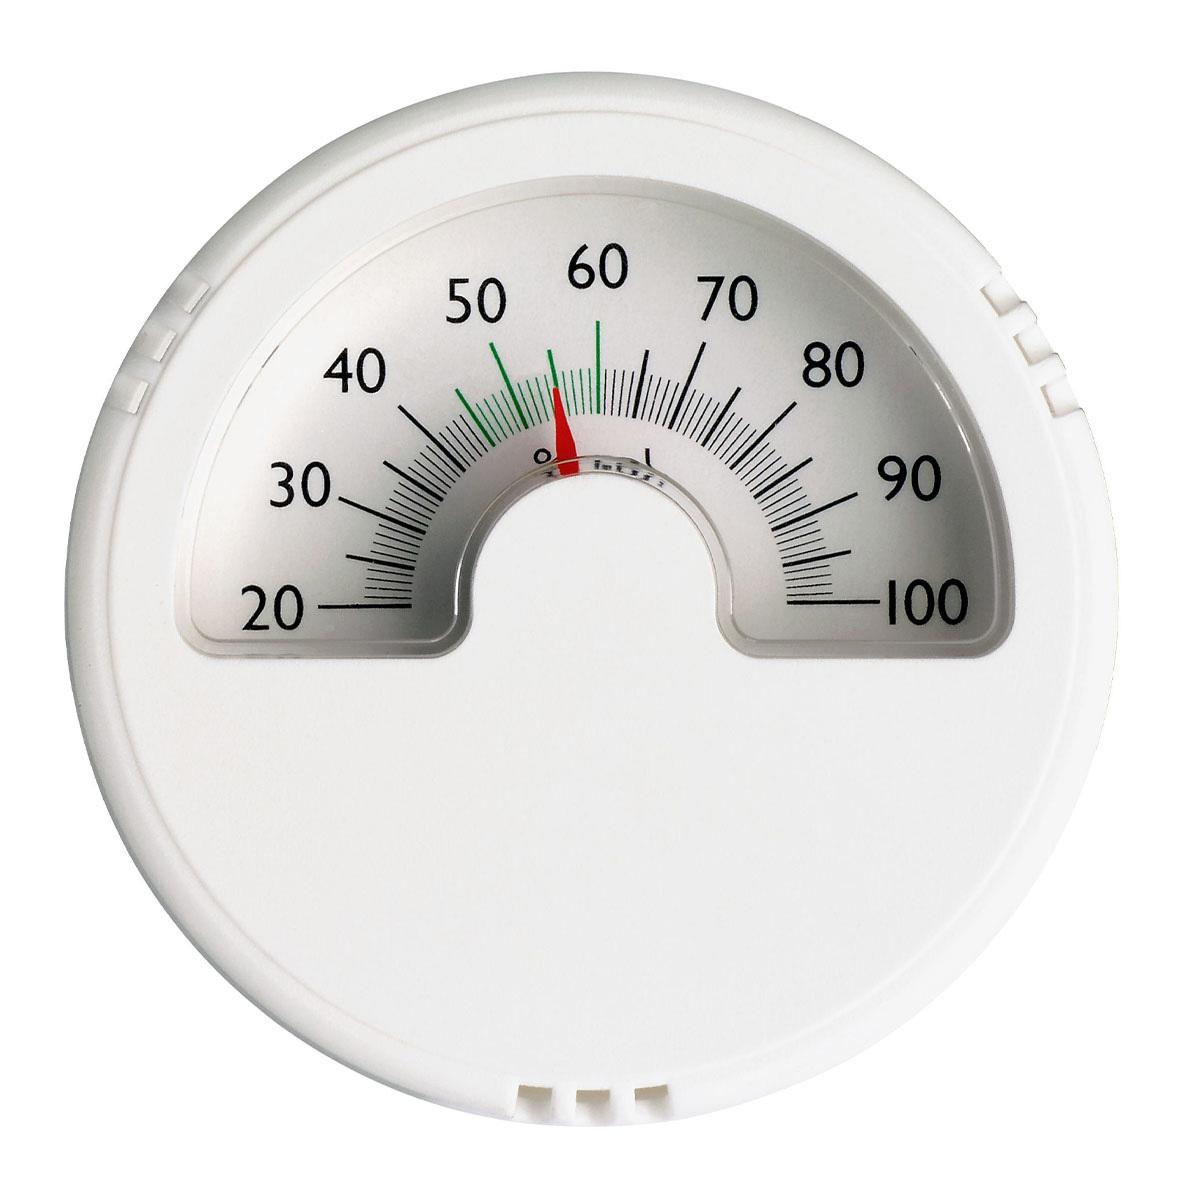 44-1007-analoges-hygrometer-1200x1200px.jpg